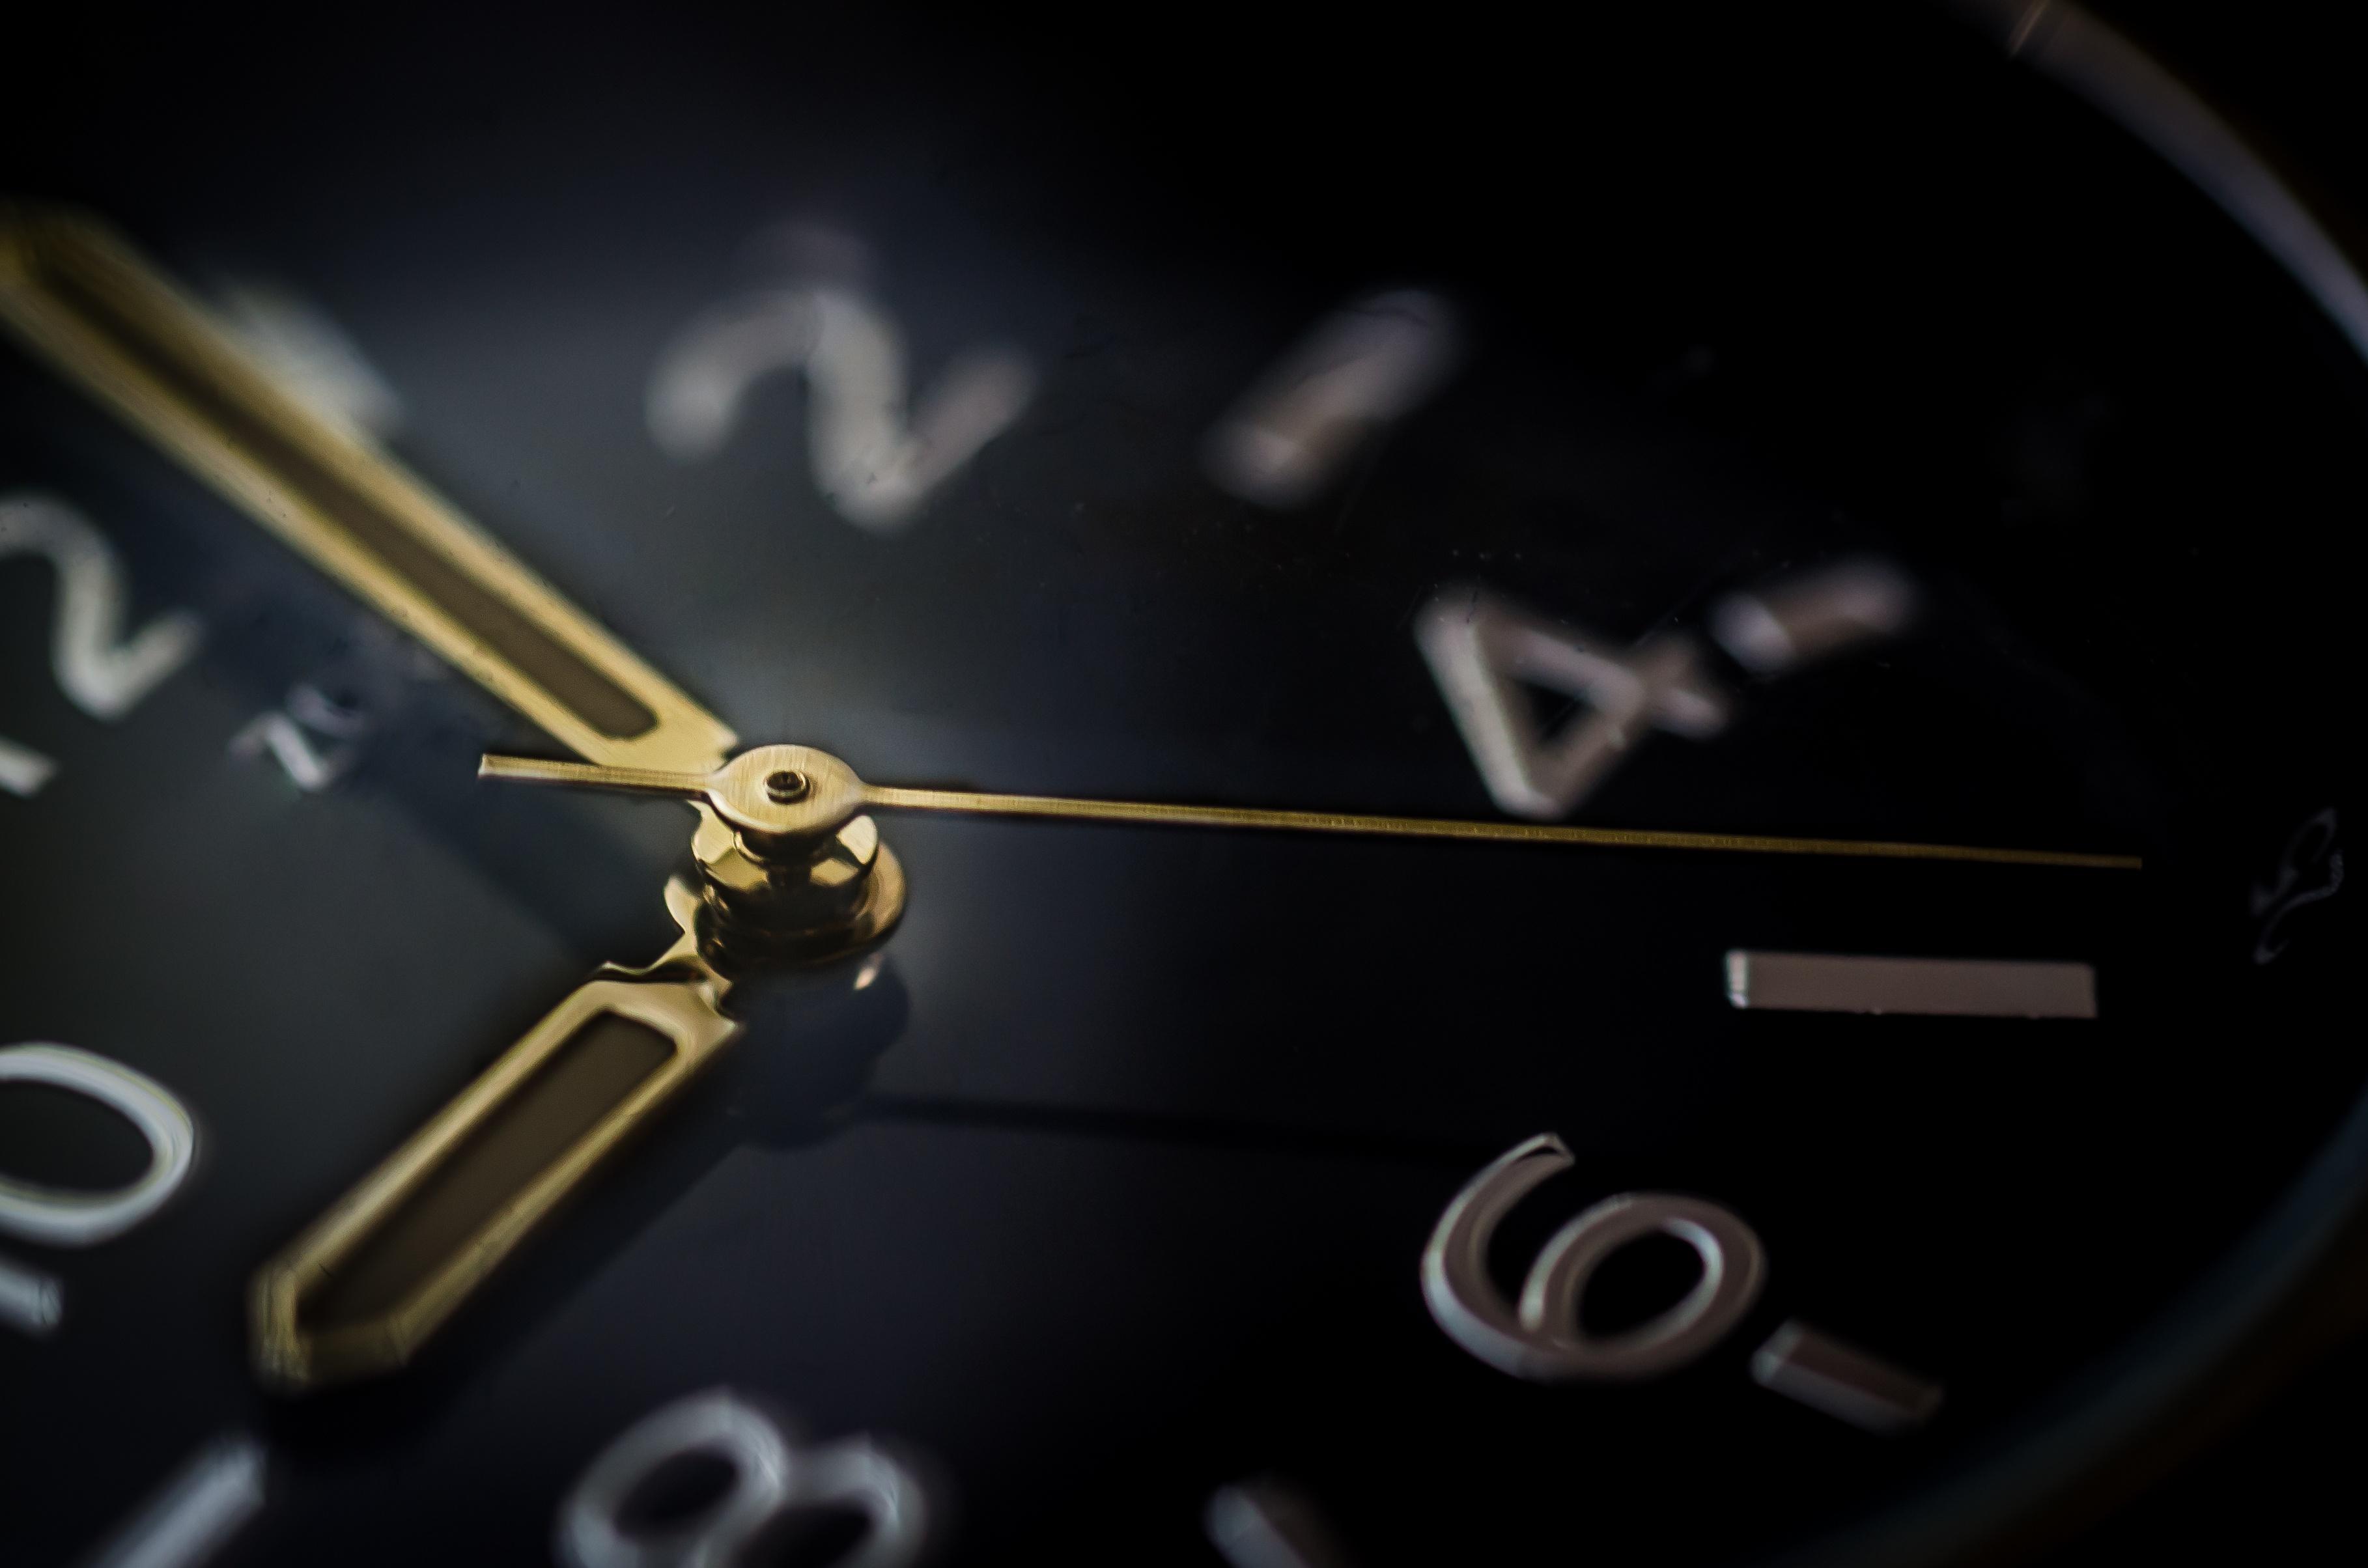 glass-time-watch-business.jpg